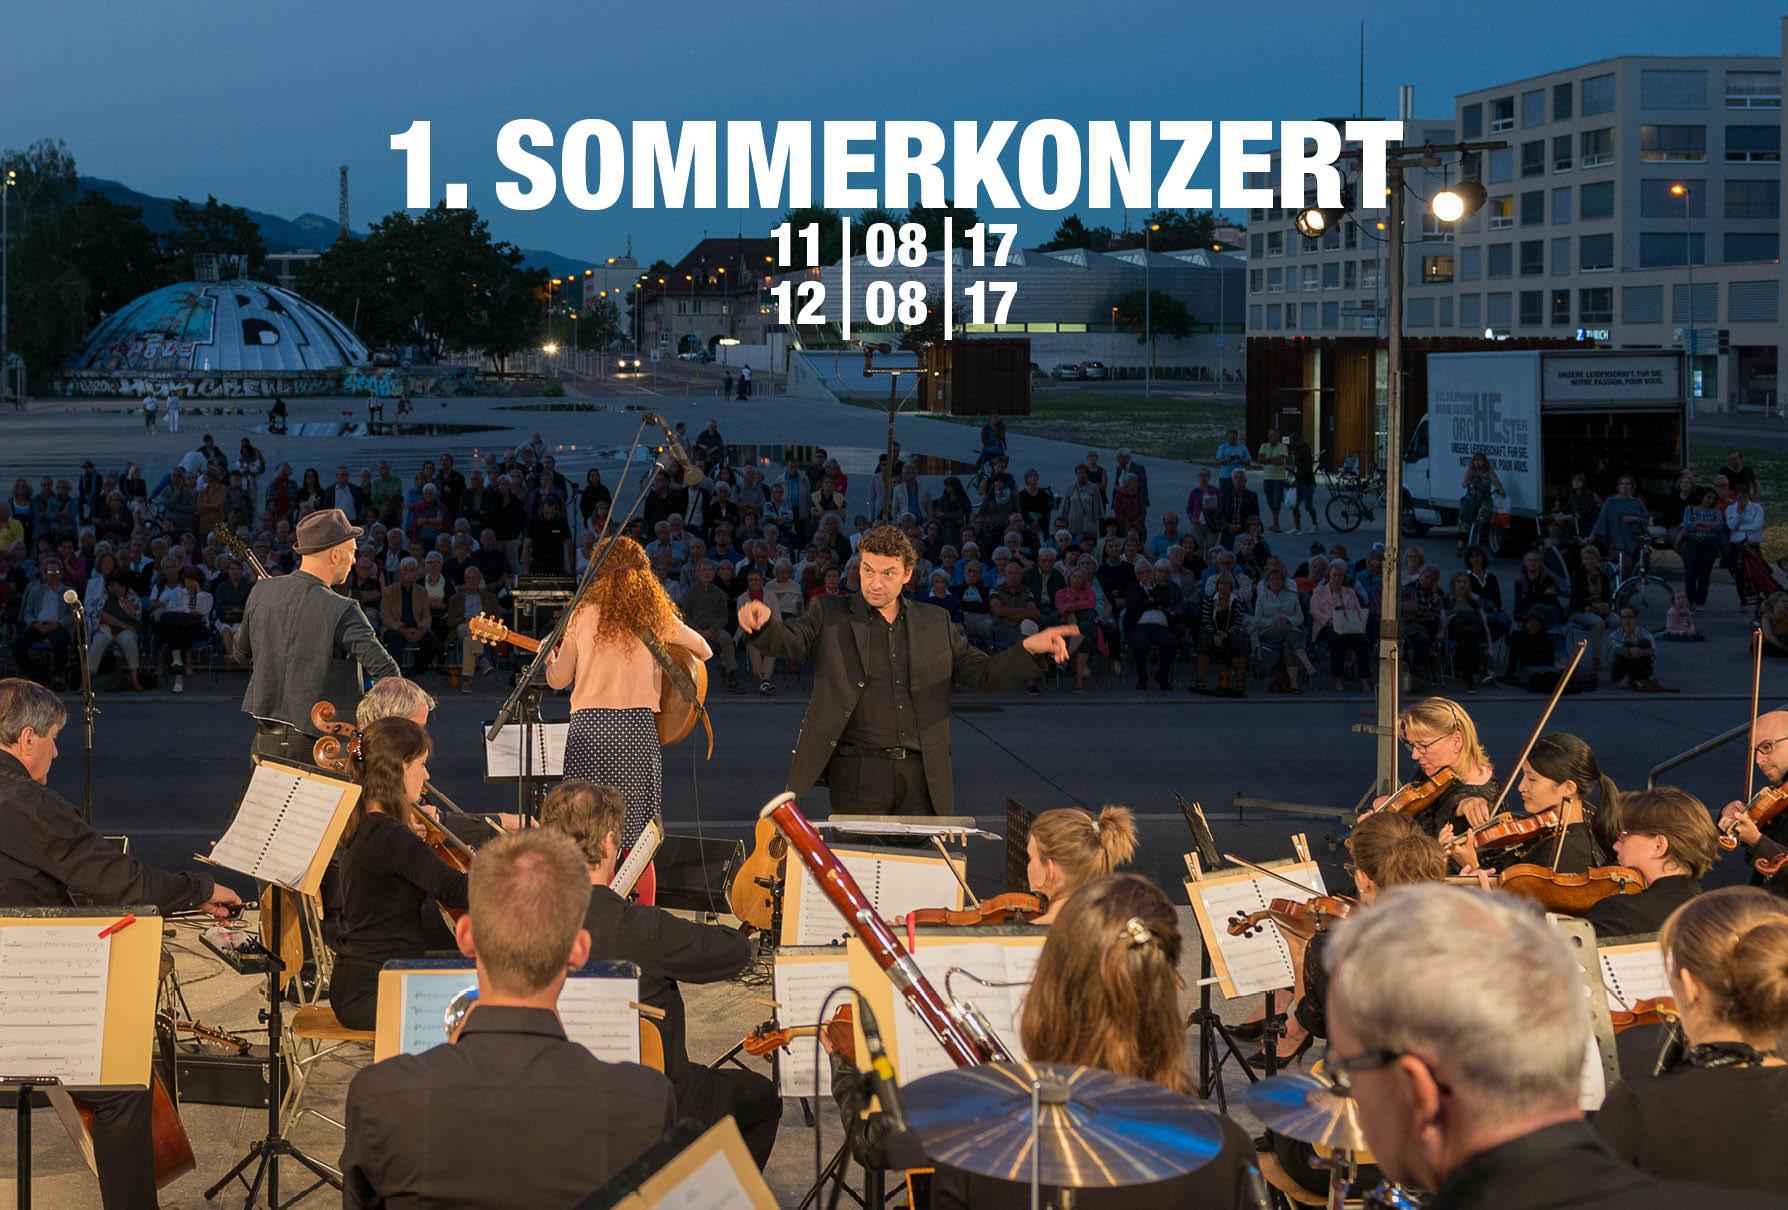 1. Sommerkonzert